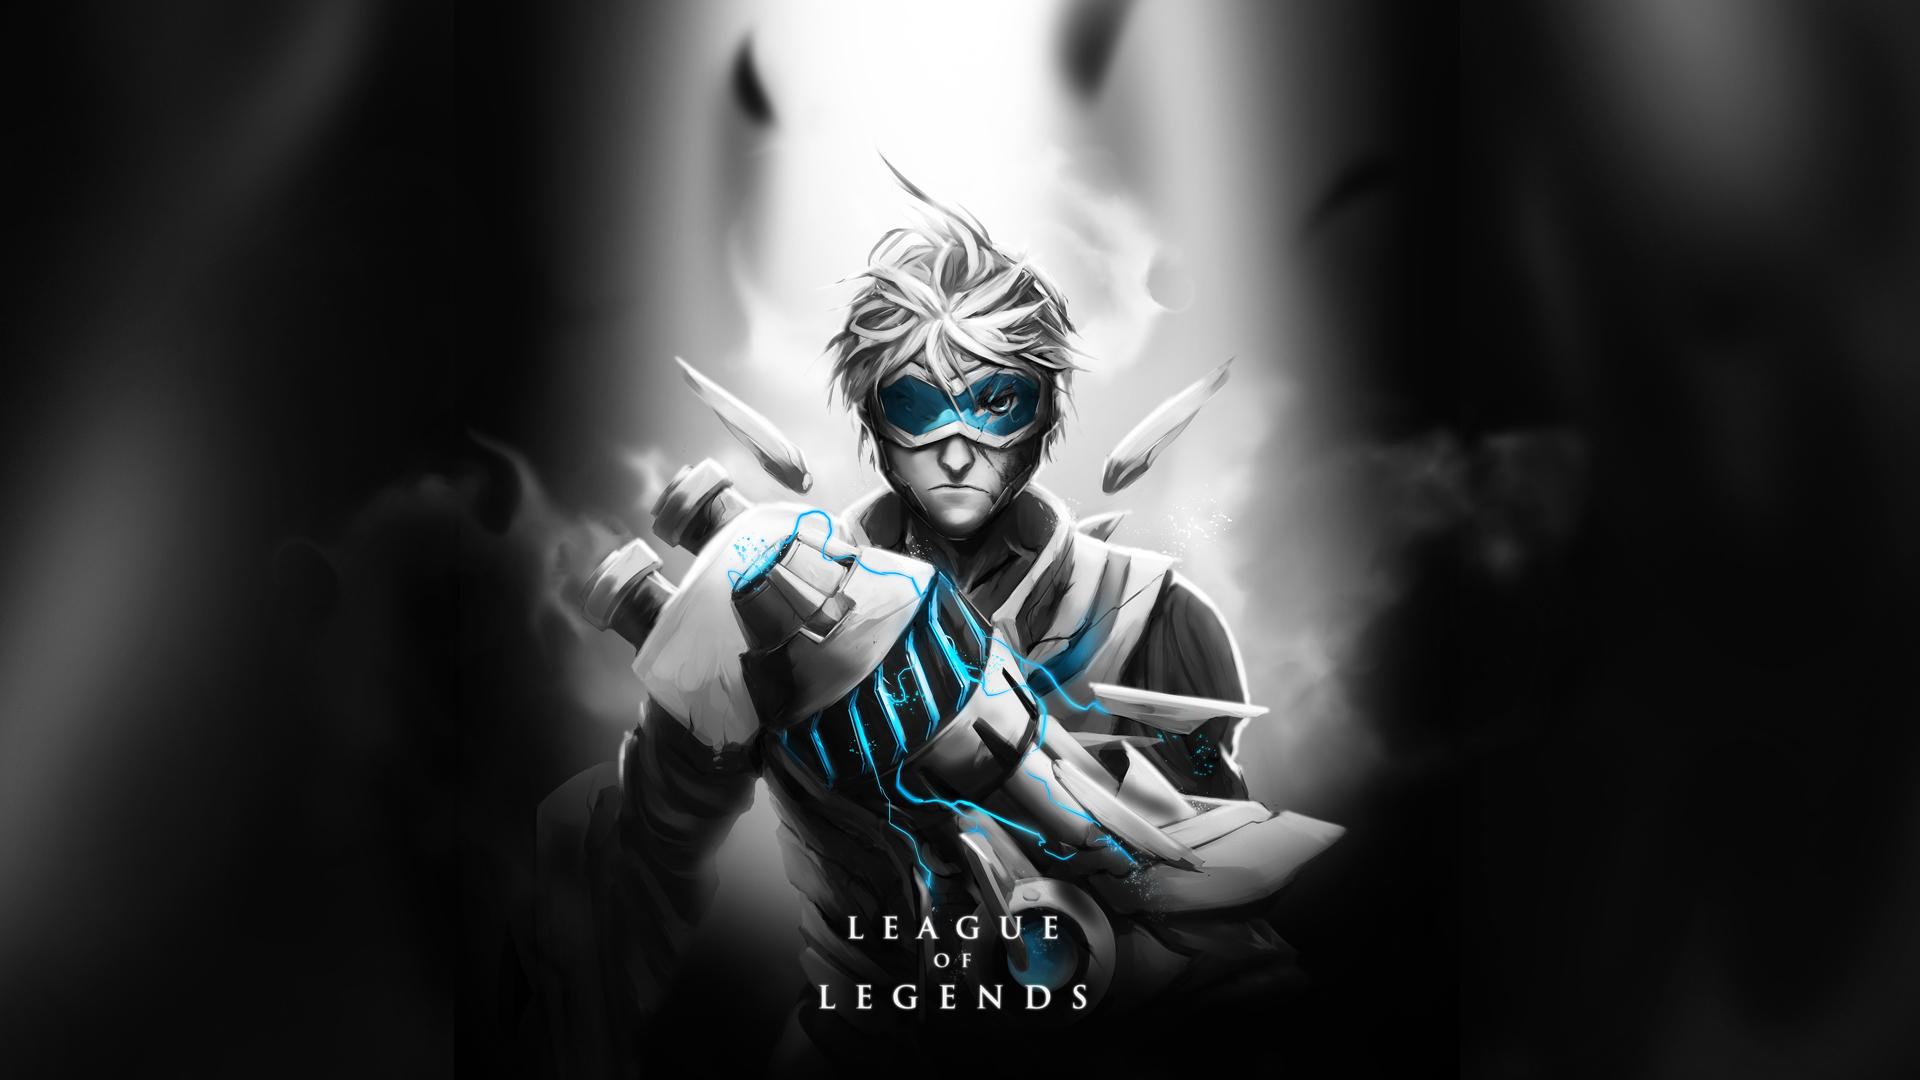 League of Legends wallpaper 90